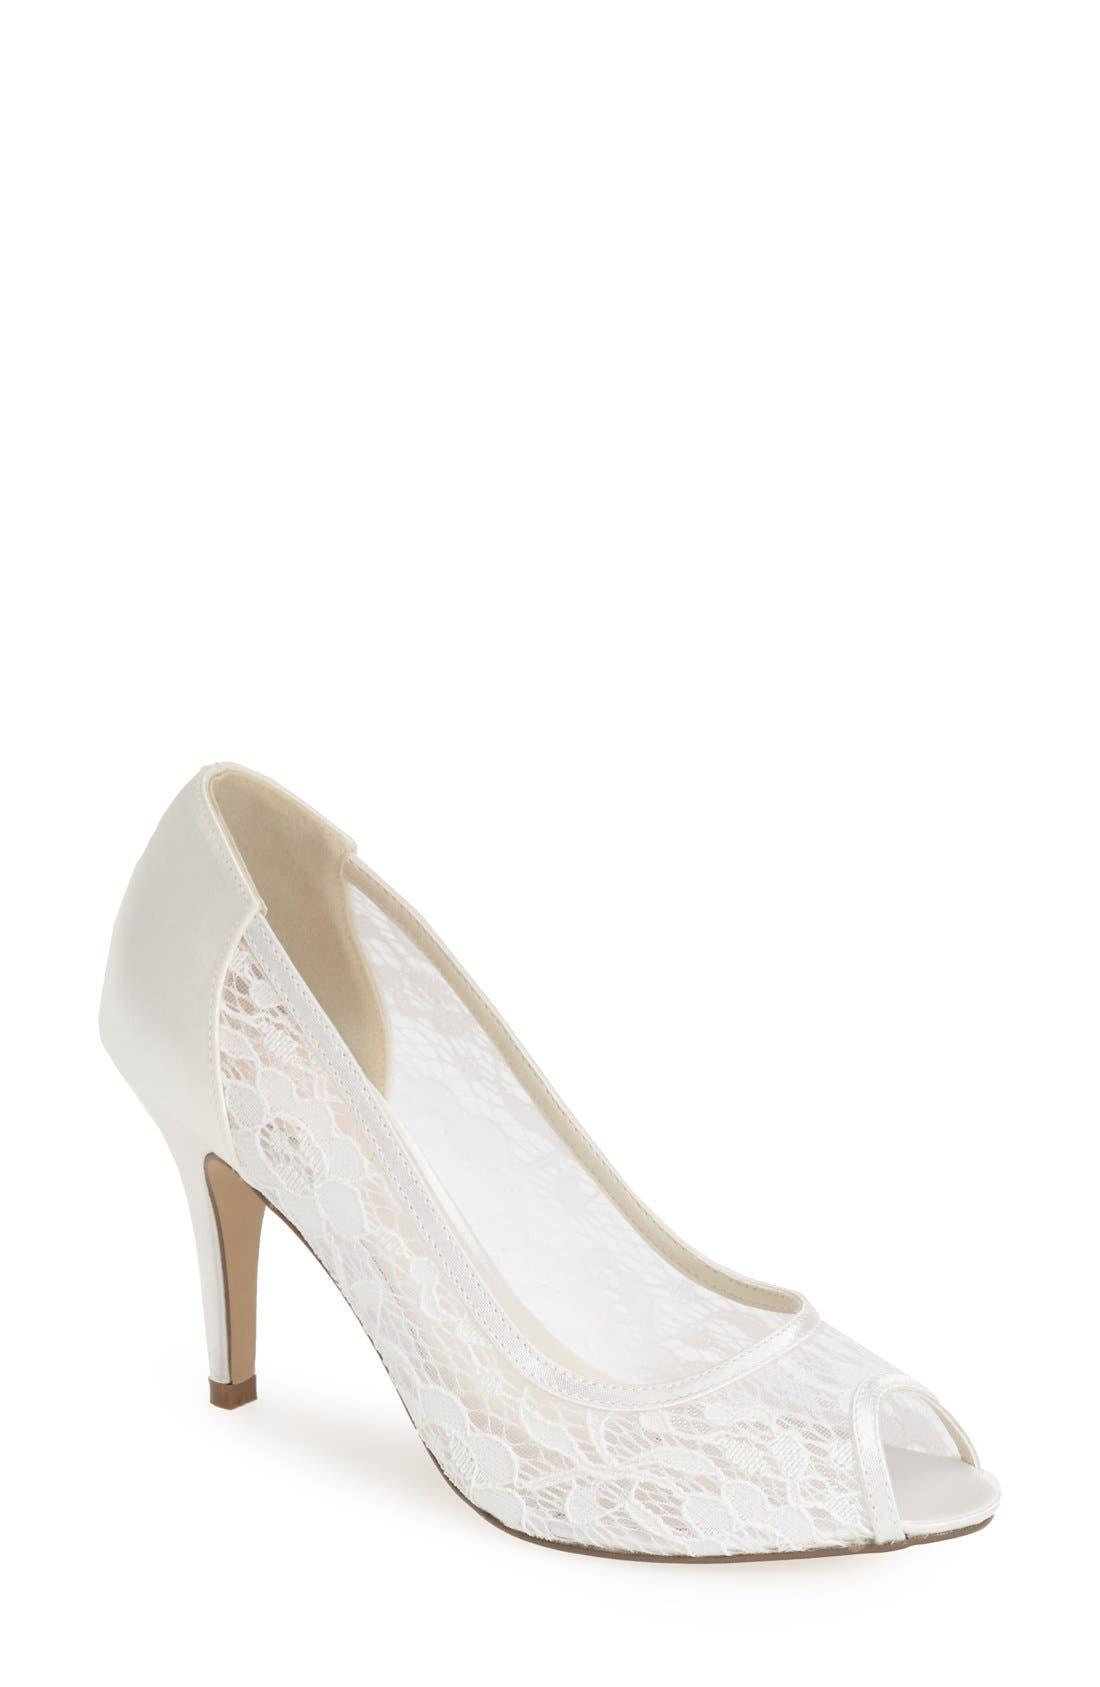 'Scrumptious' Lace Peep Toe Sandal,                         Main,                         color, IVORY MESH LACE